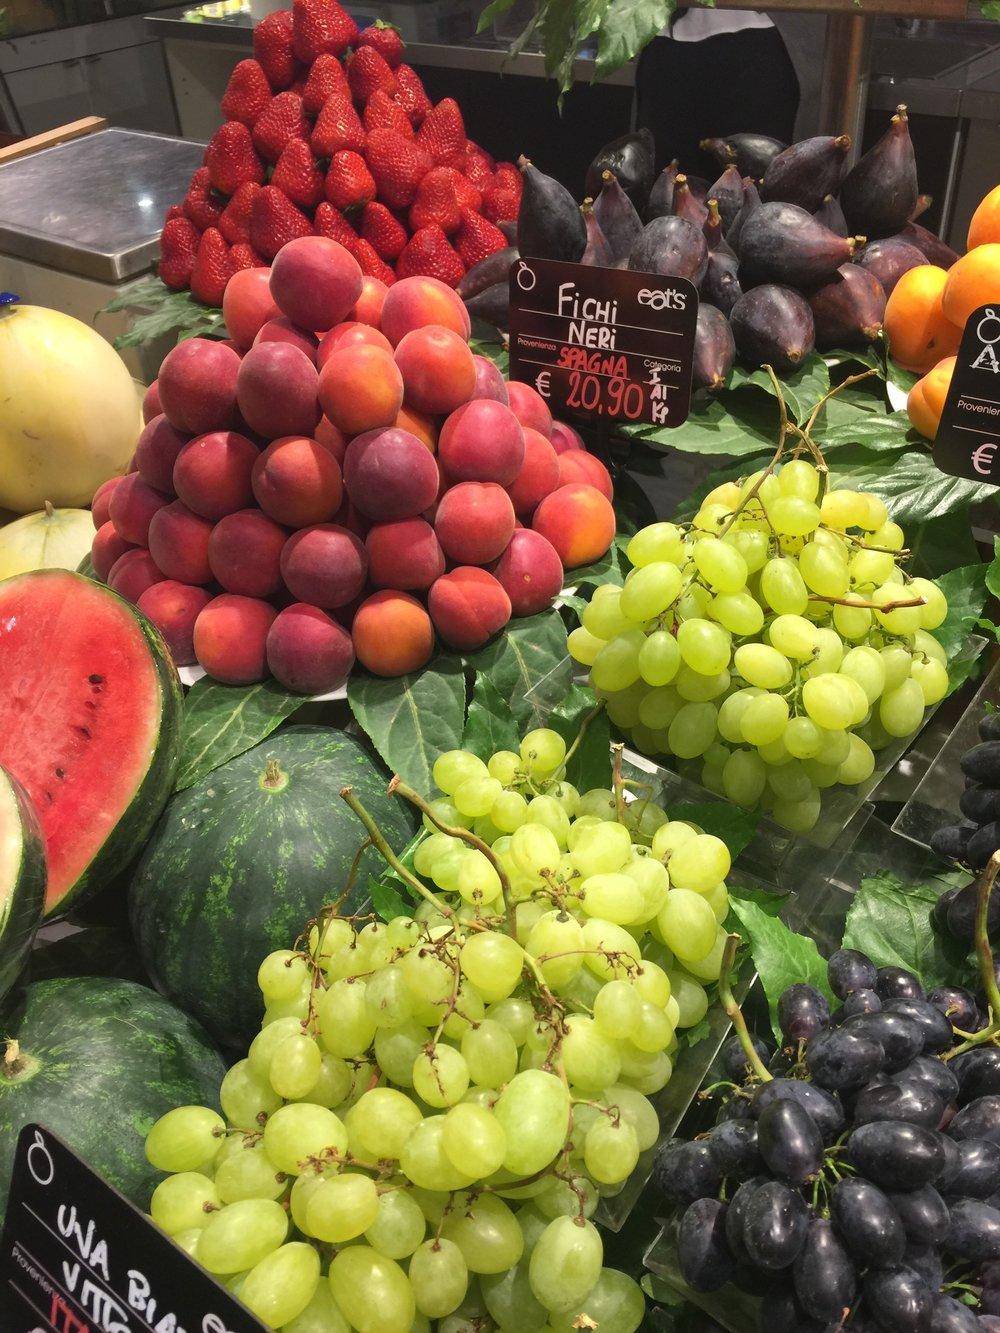 fruits carolina levie purefood.jpg